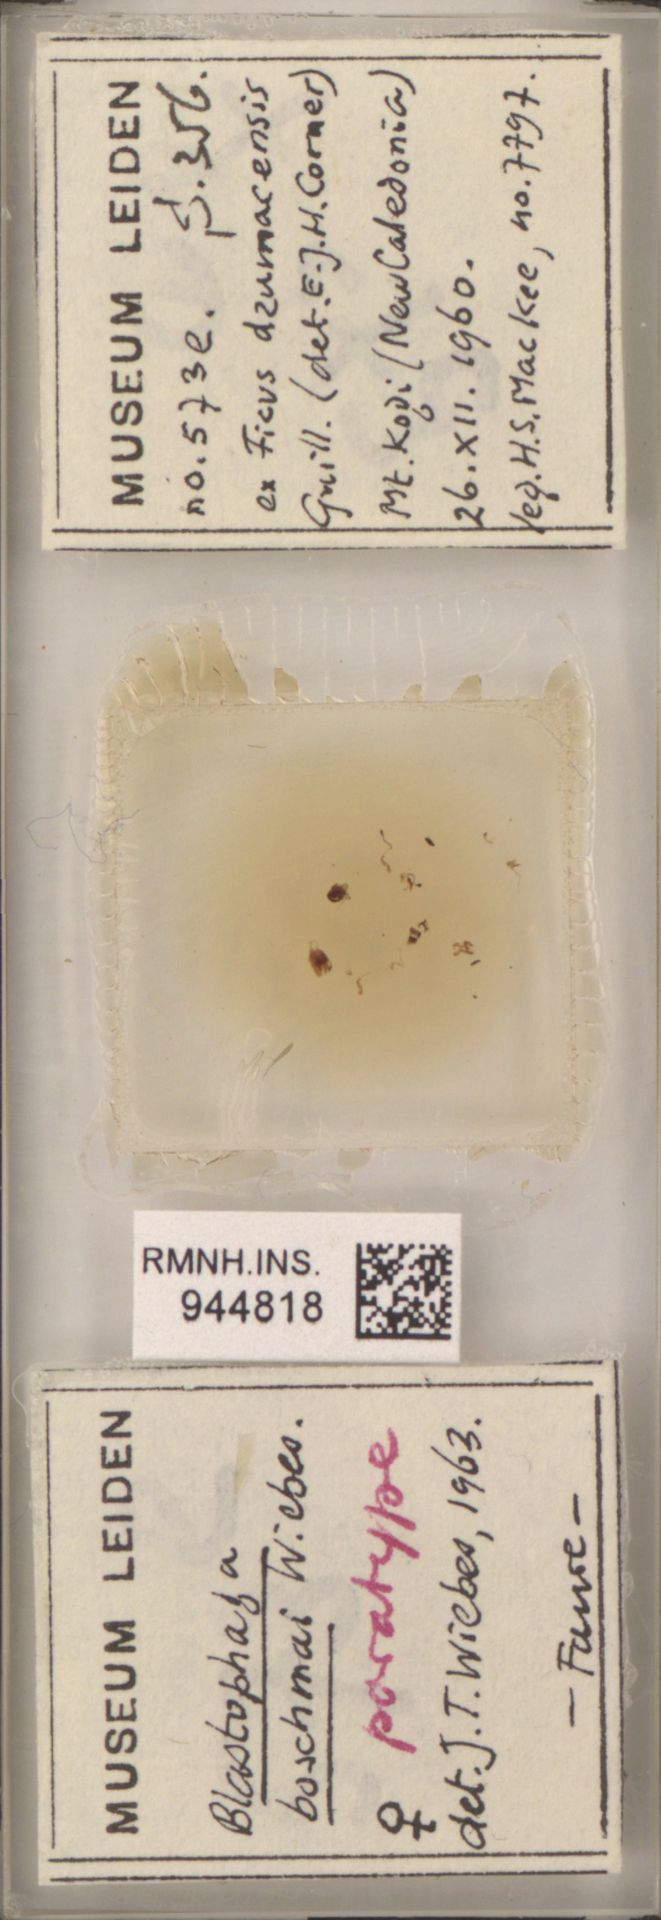 RMNH.INS.944818 | Blastophaga boschmai Wiebes